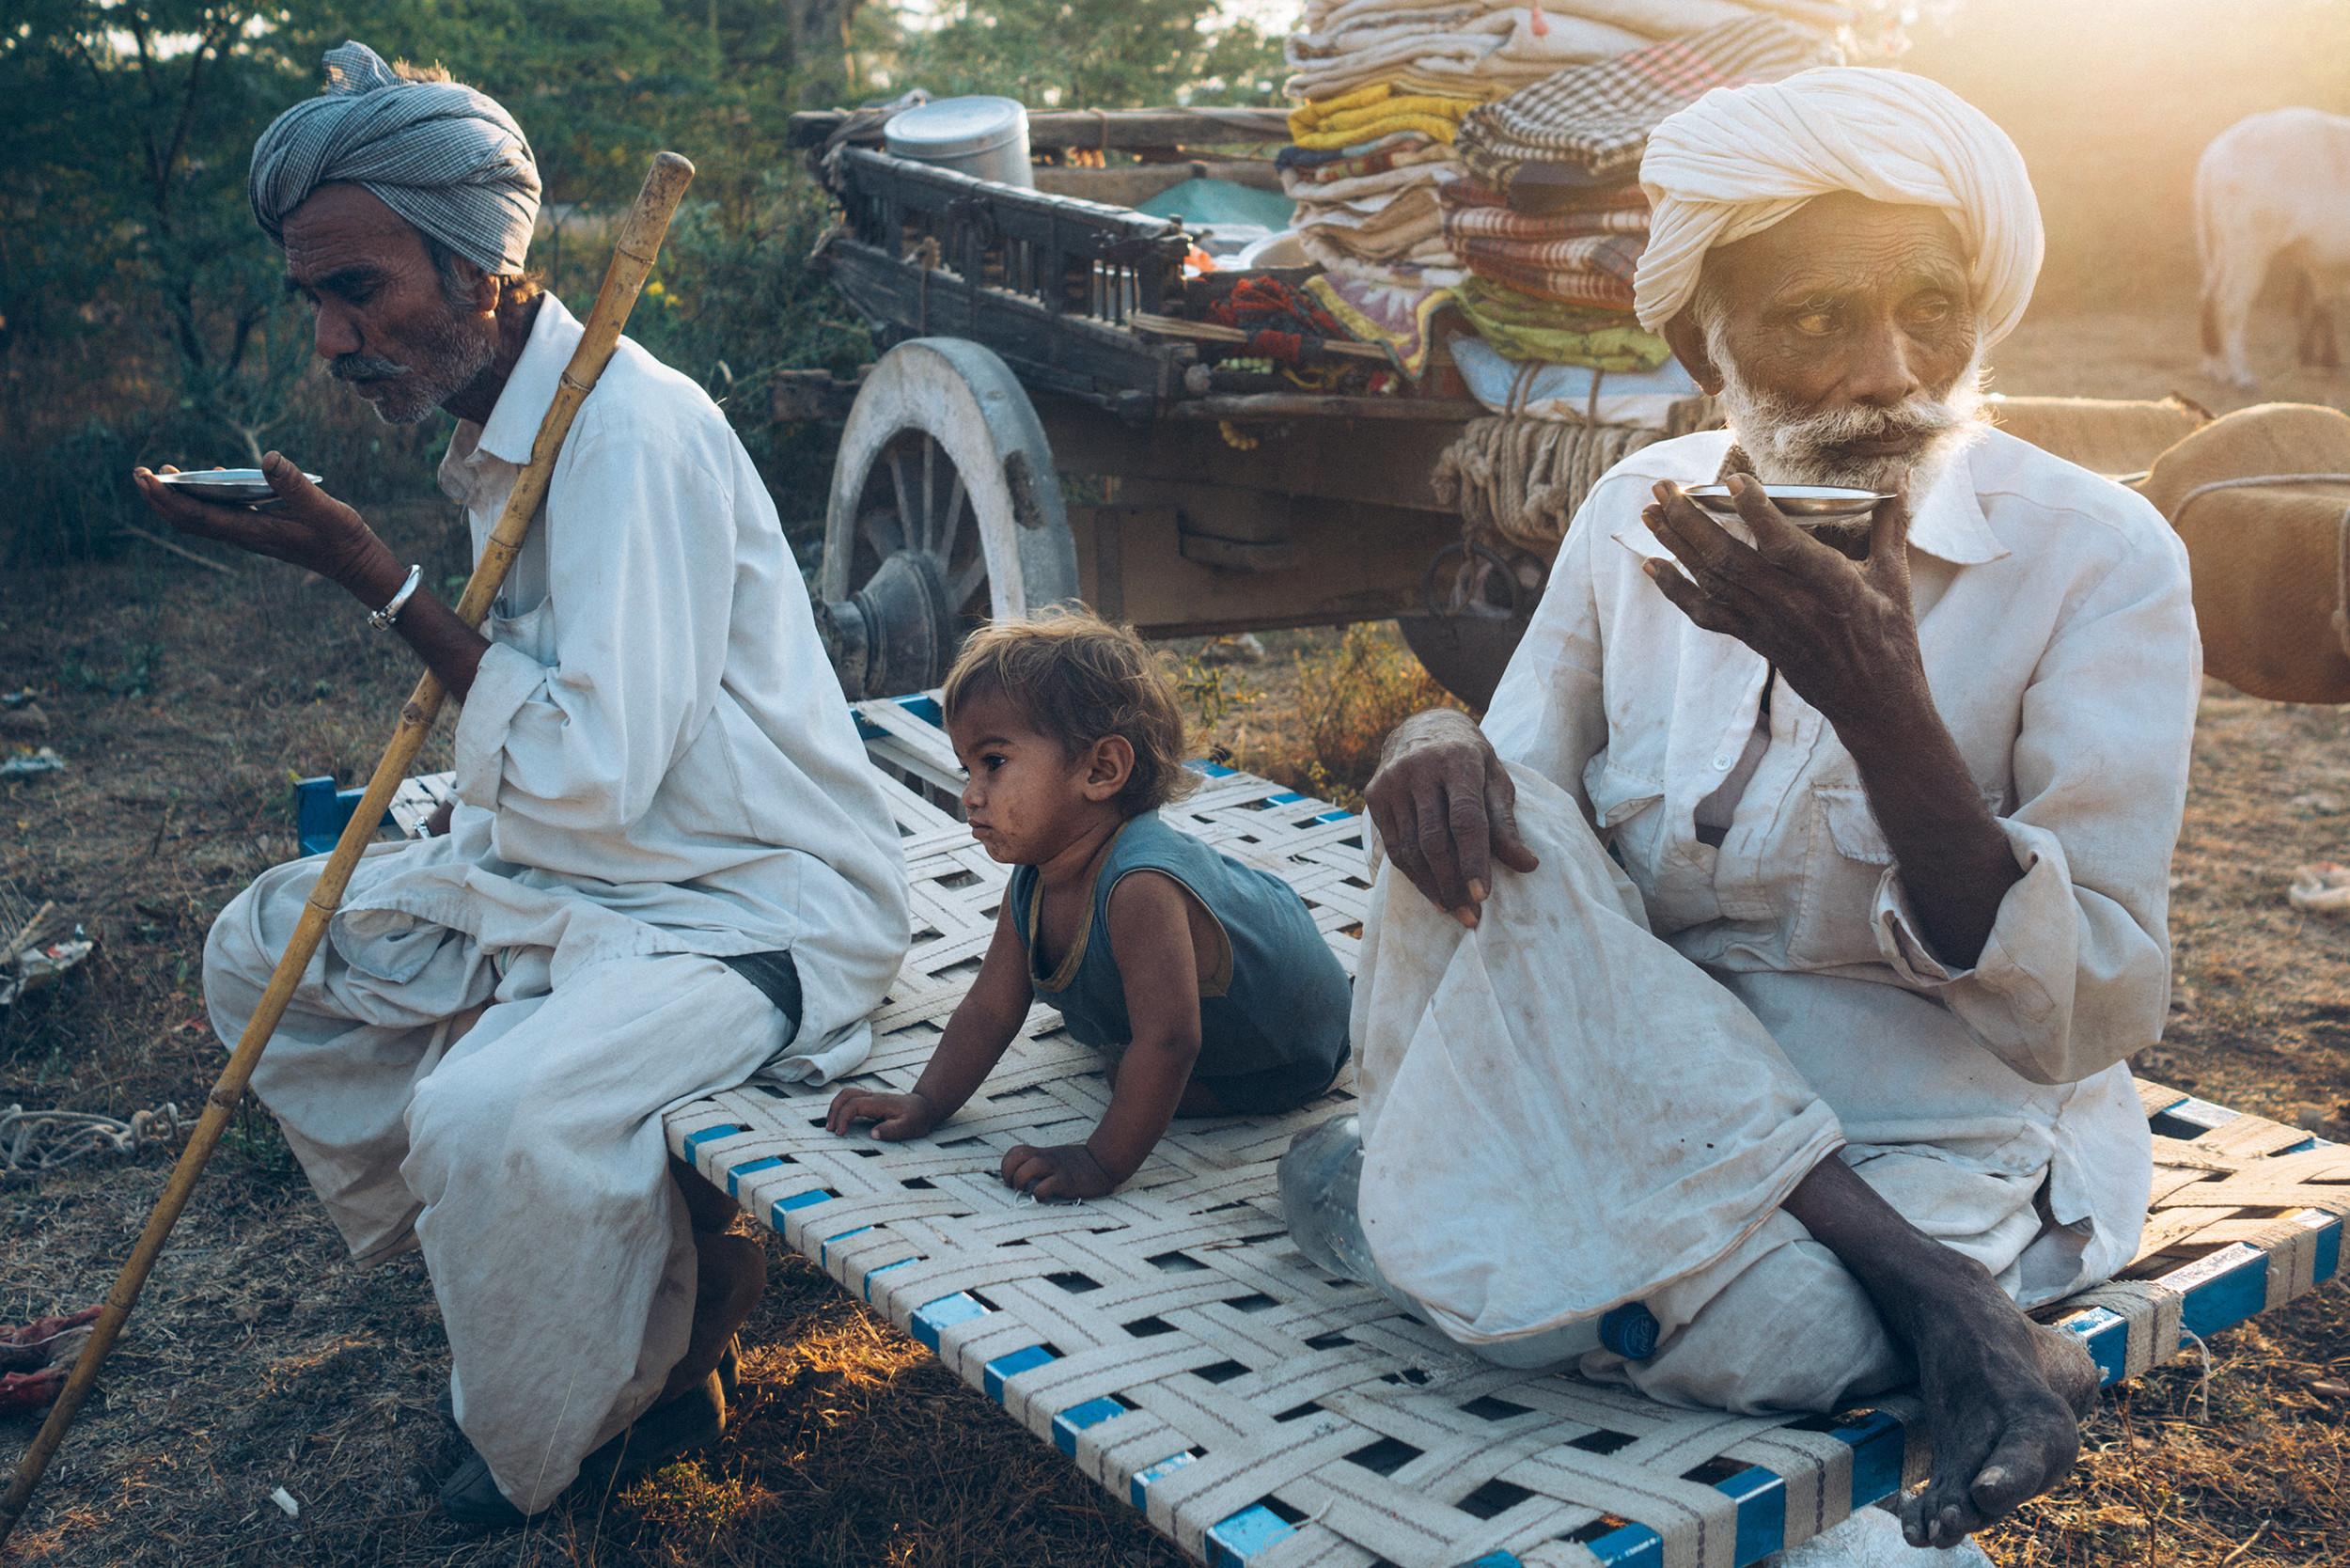 Nomad grandfathers drink tea